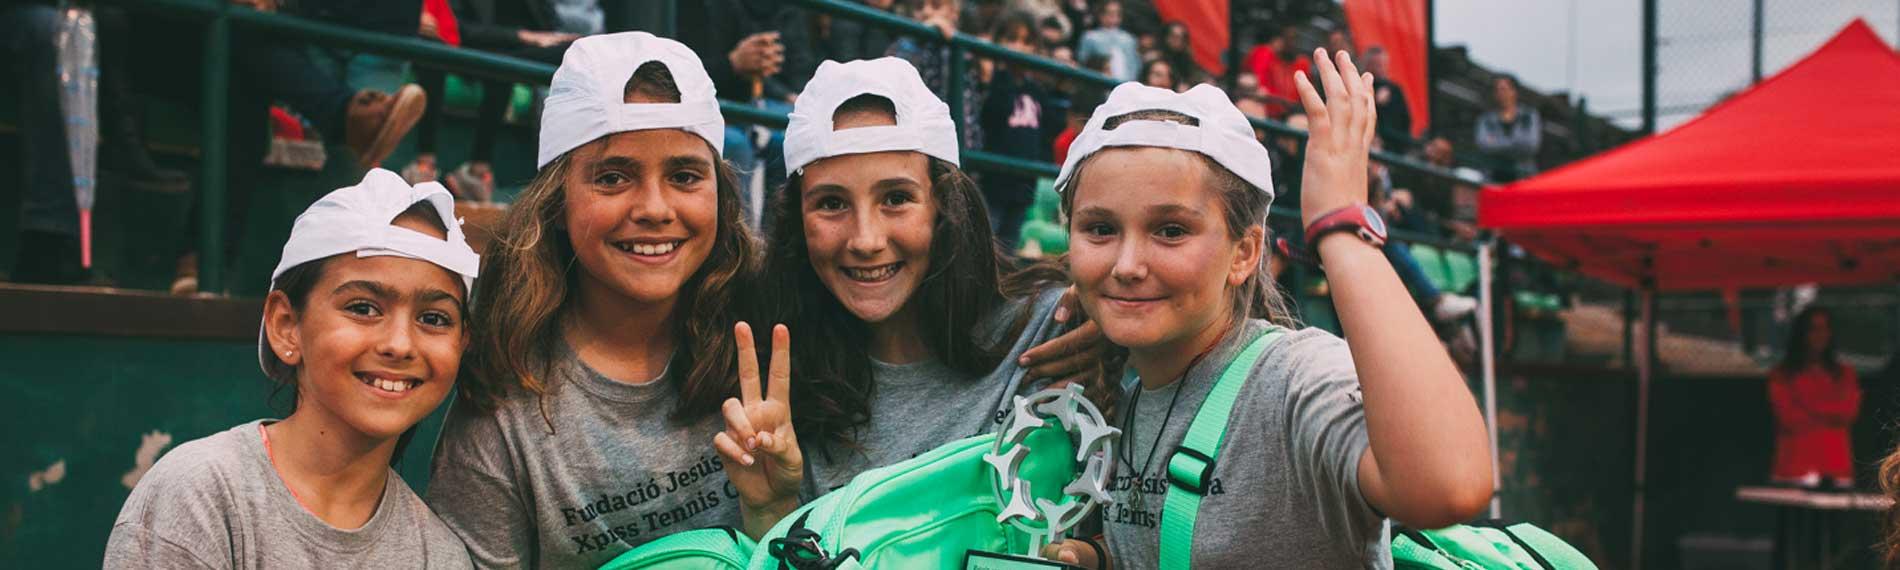 Xpress Tennis Cup